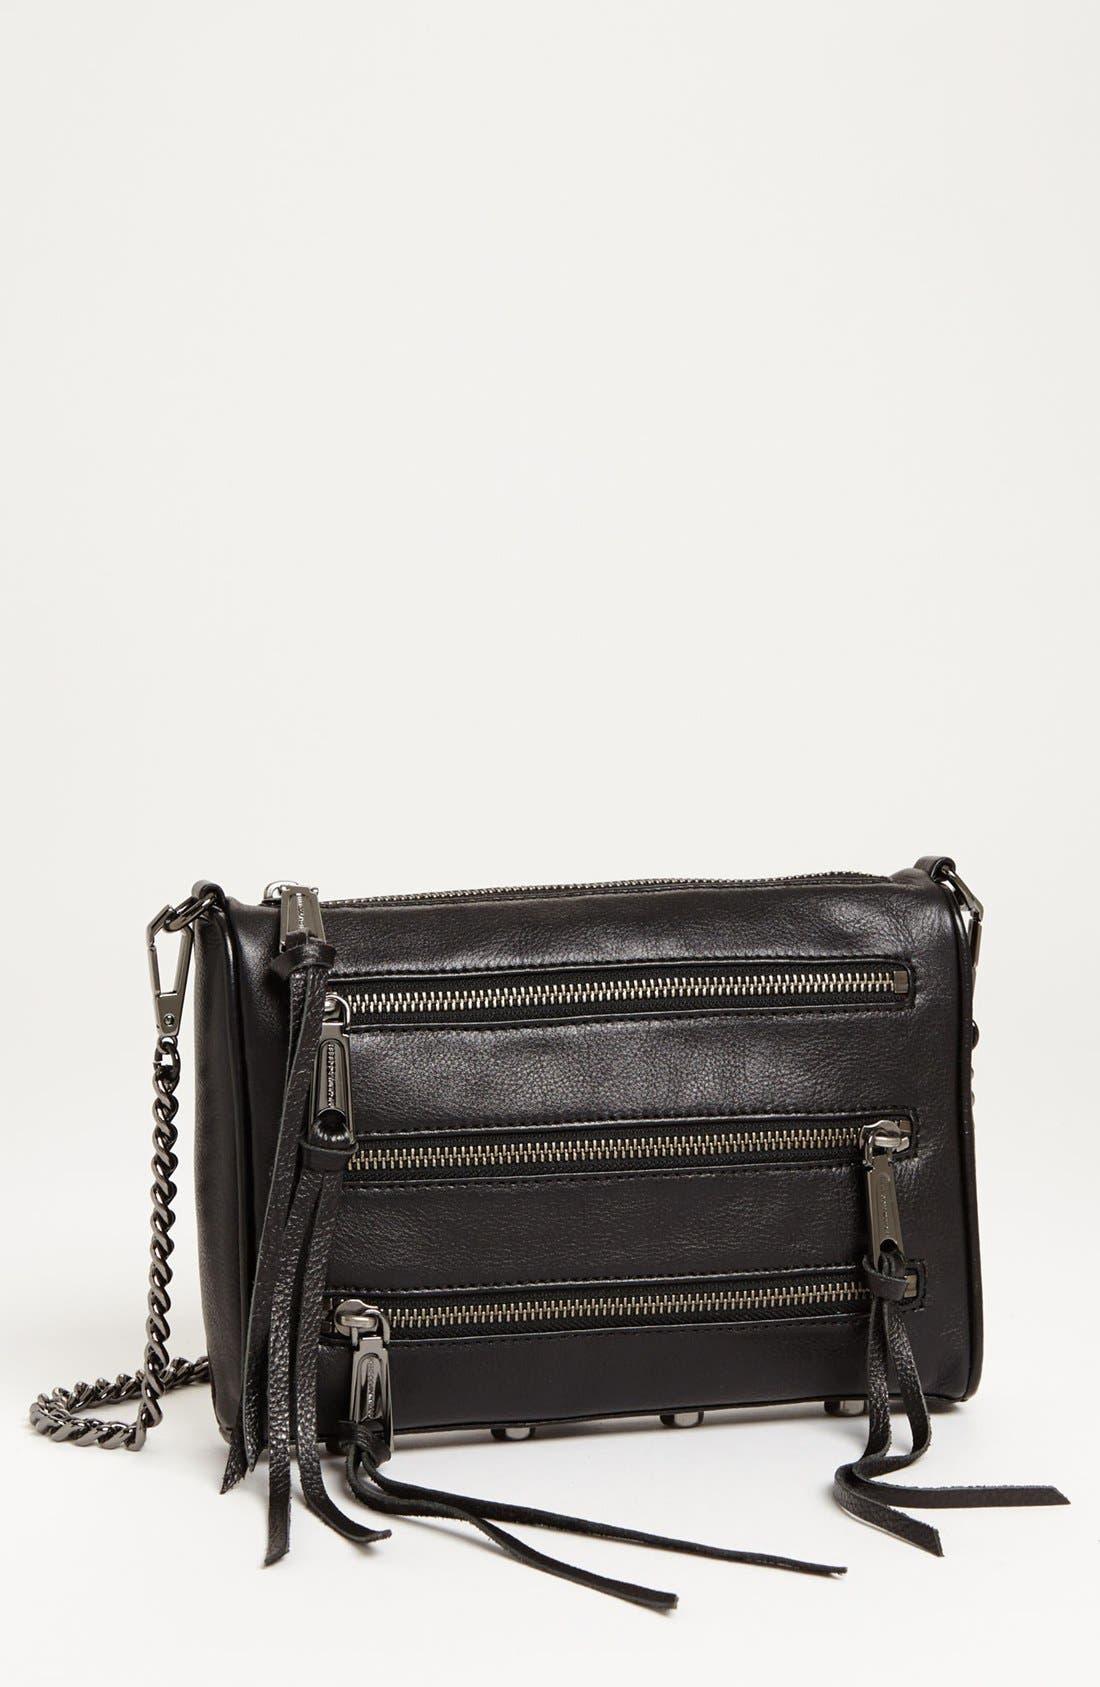 Main Image - Rebecca Minkoff '5 Zip - Mini' Crossbody Bag